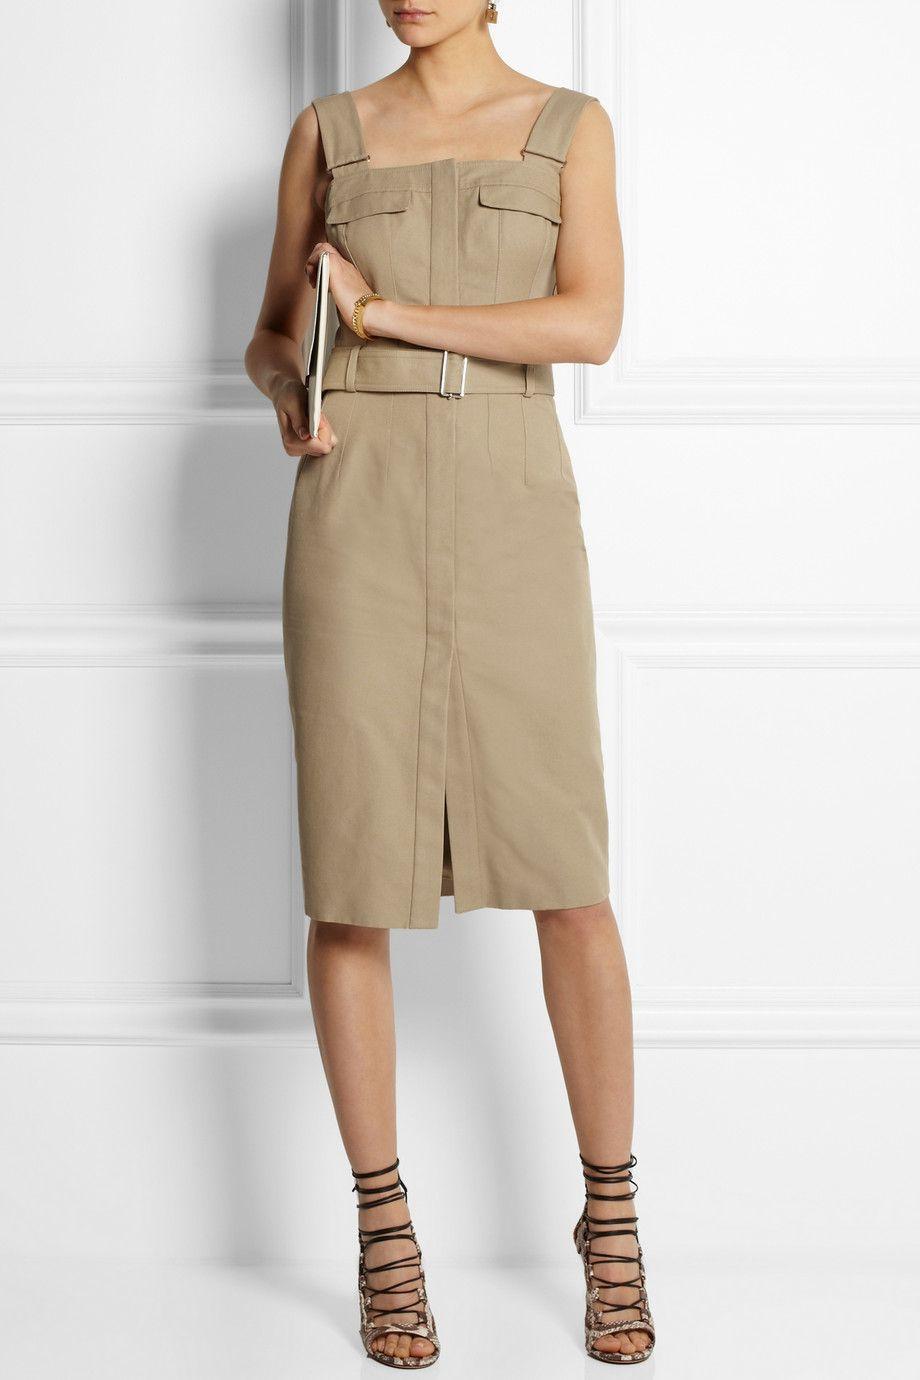 Alexander McQueen dress, Chloe bracelet, Aquazzura shoes, Stella McCartney clutch.